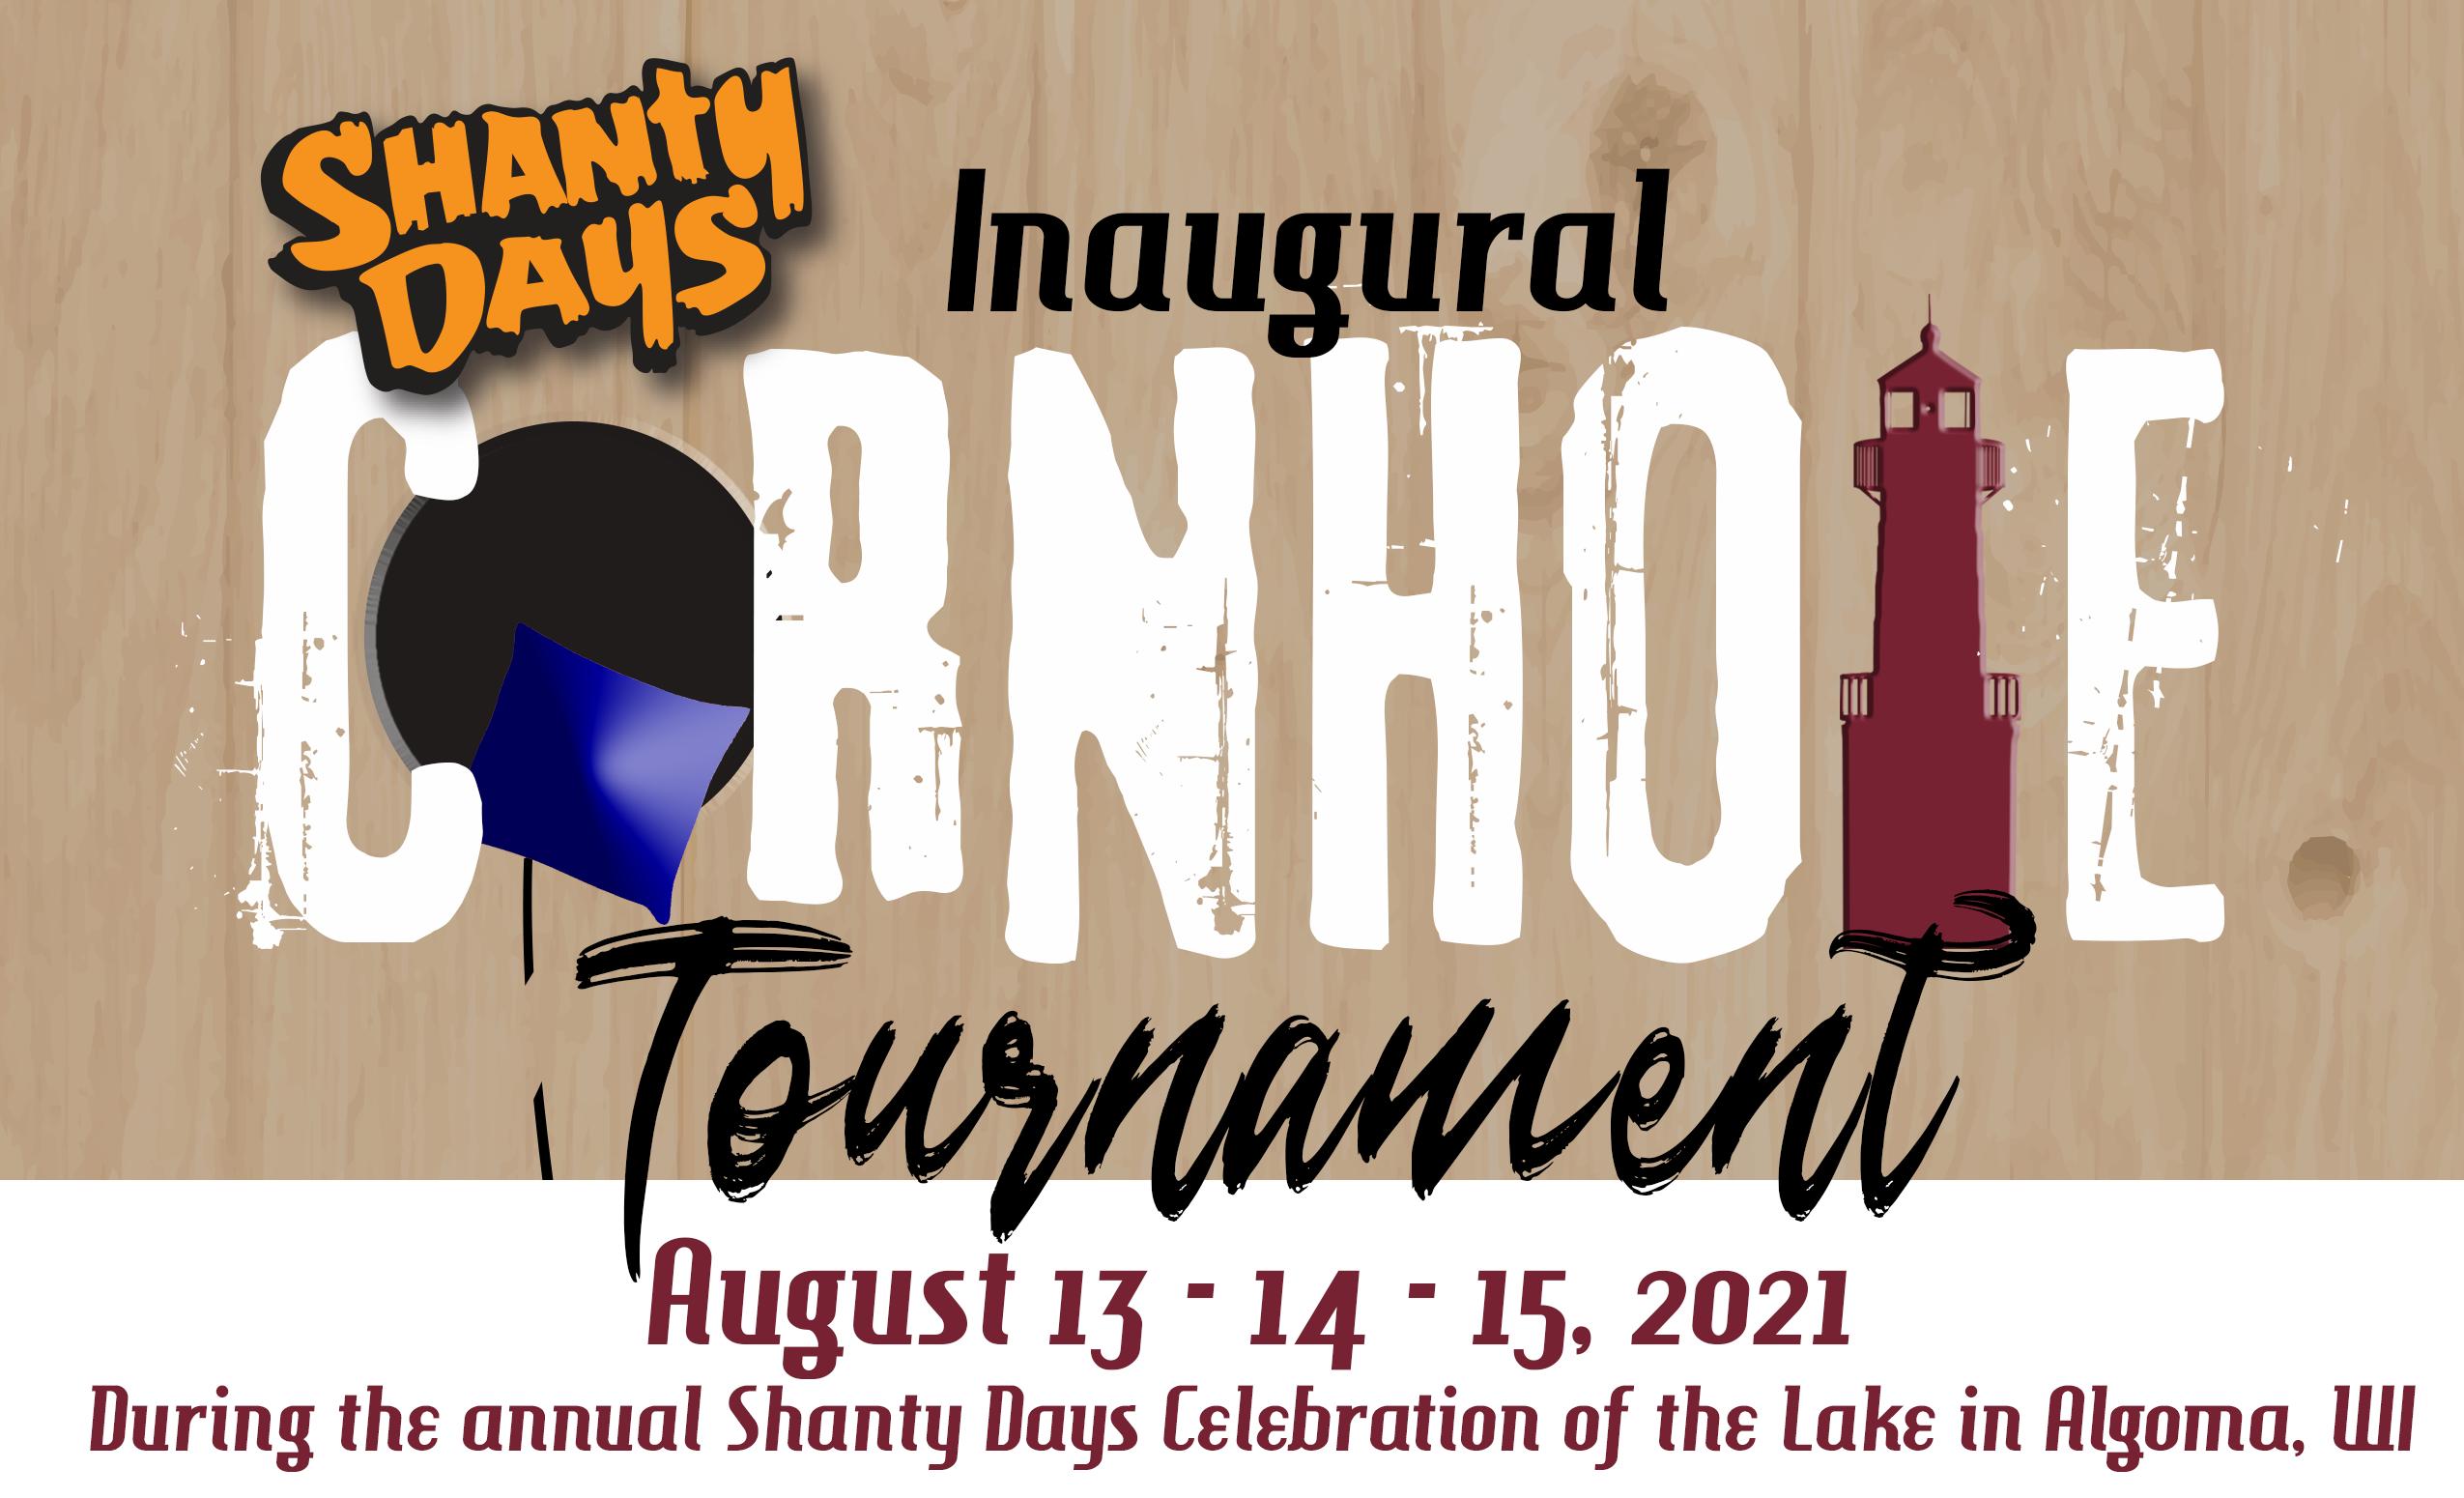 2021 Shanty Days Cornhole Tournament